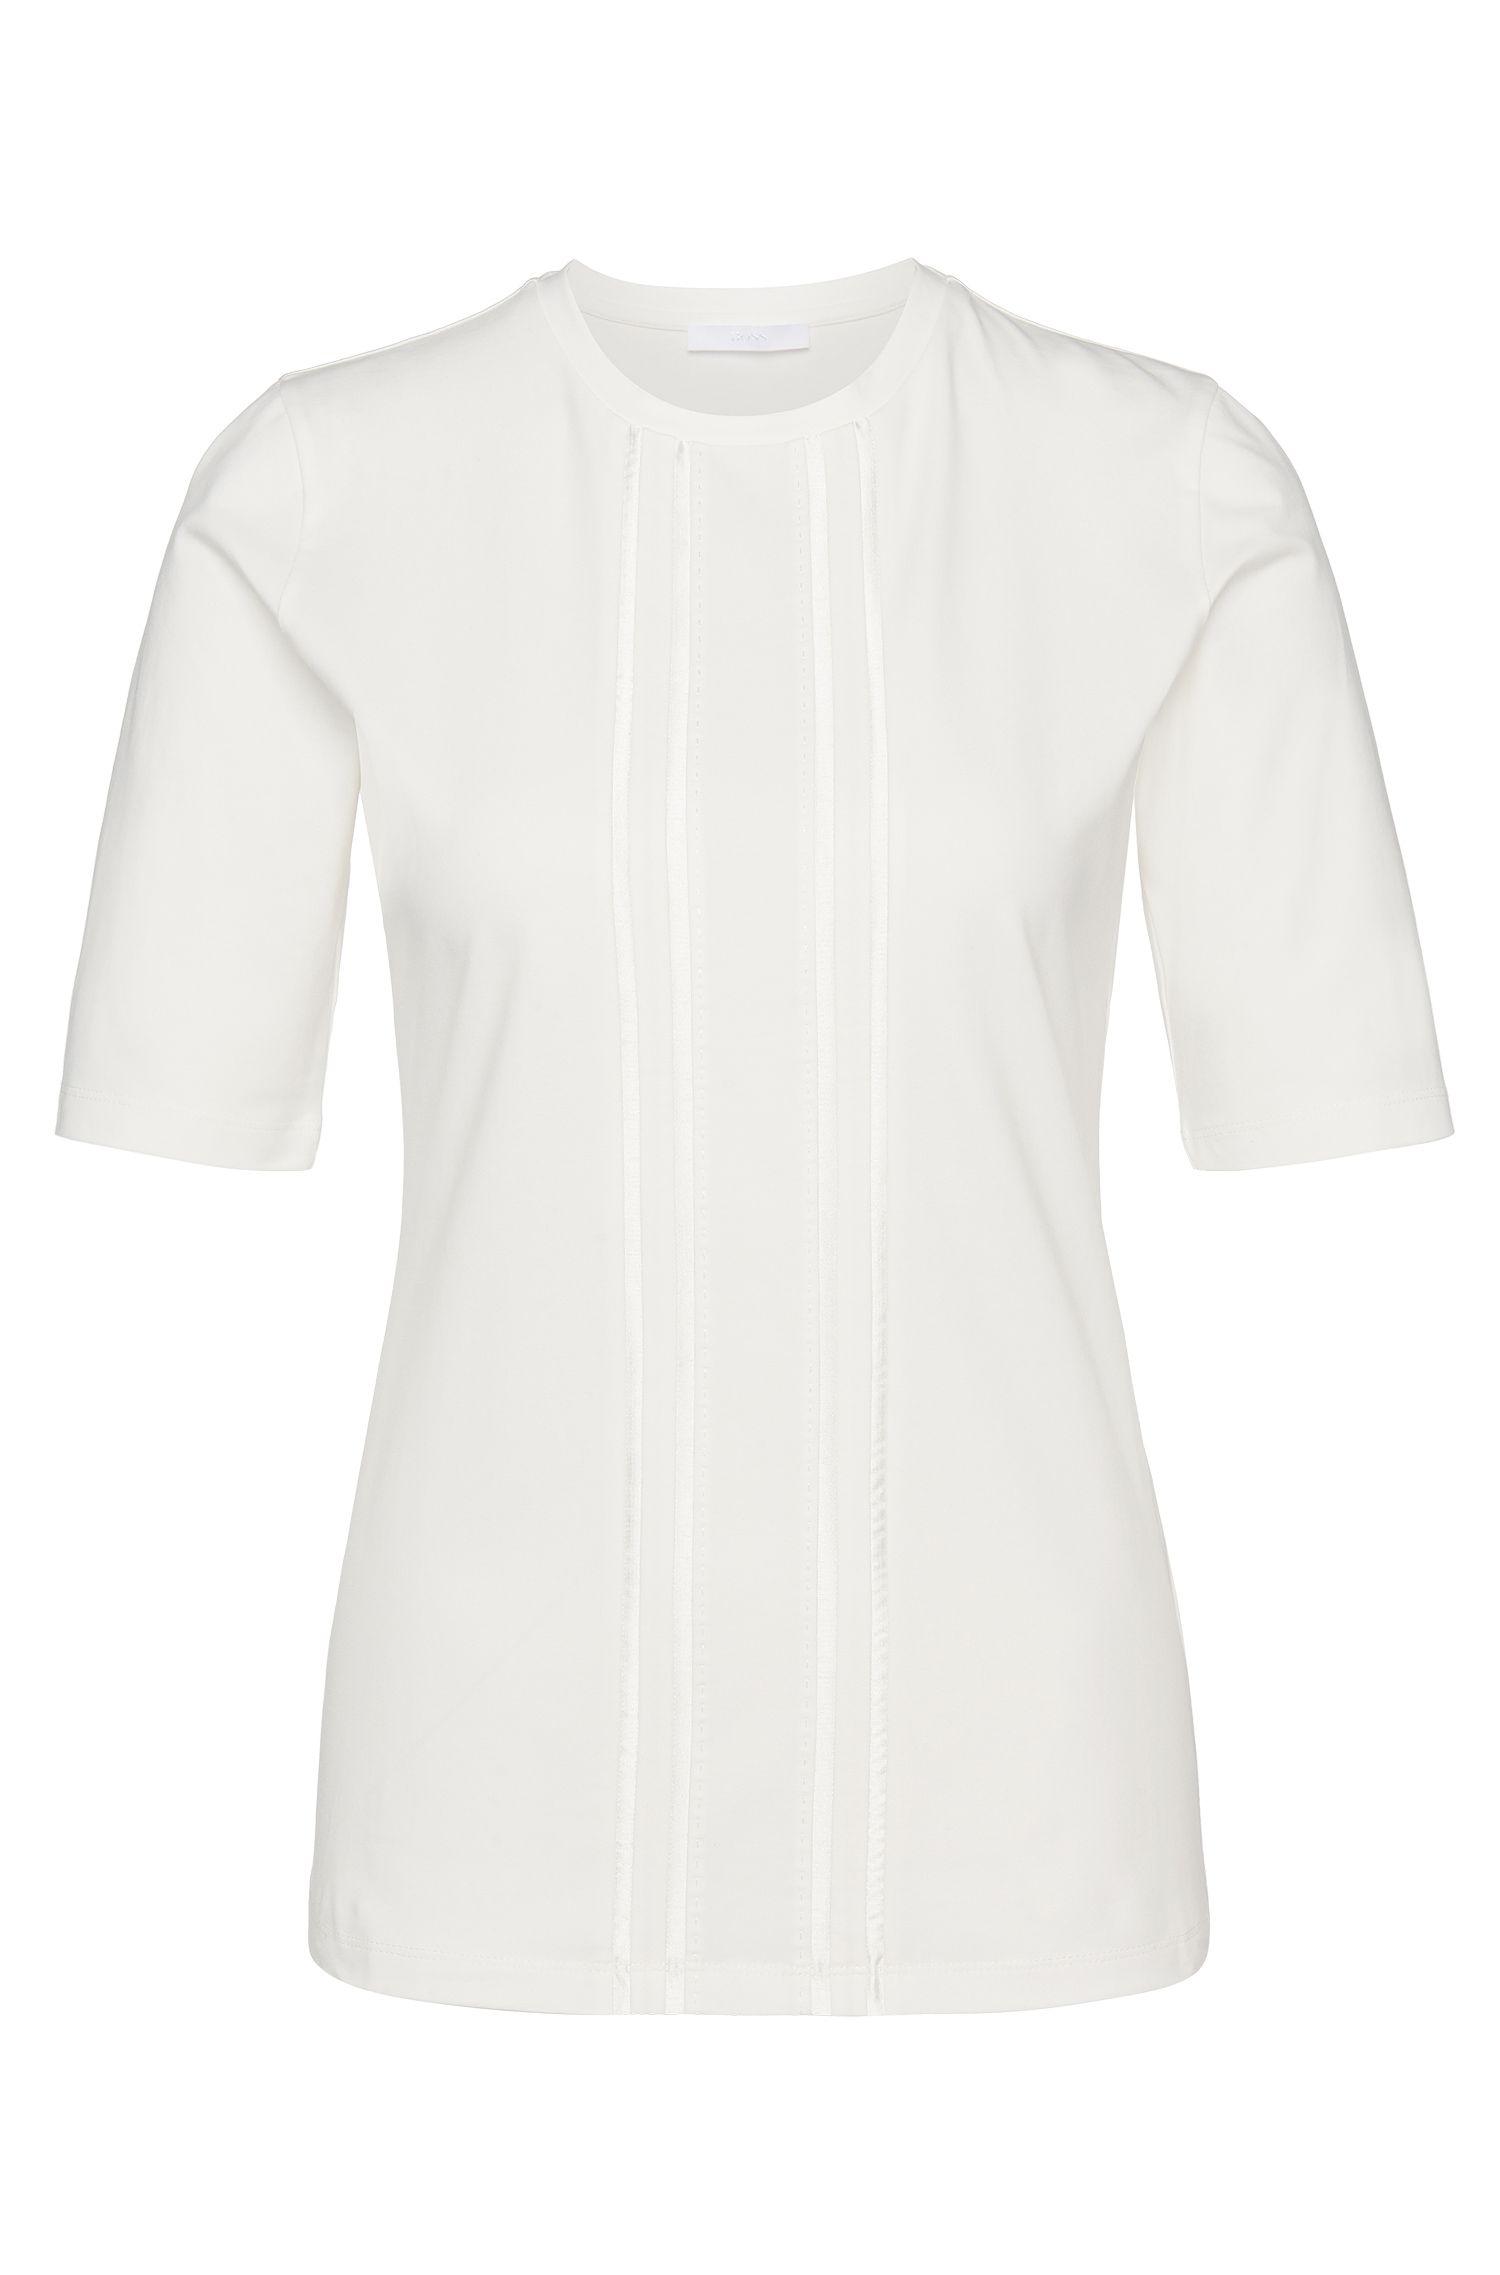 T-shirt en coton stretch: «Ejena»